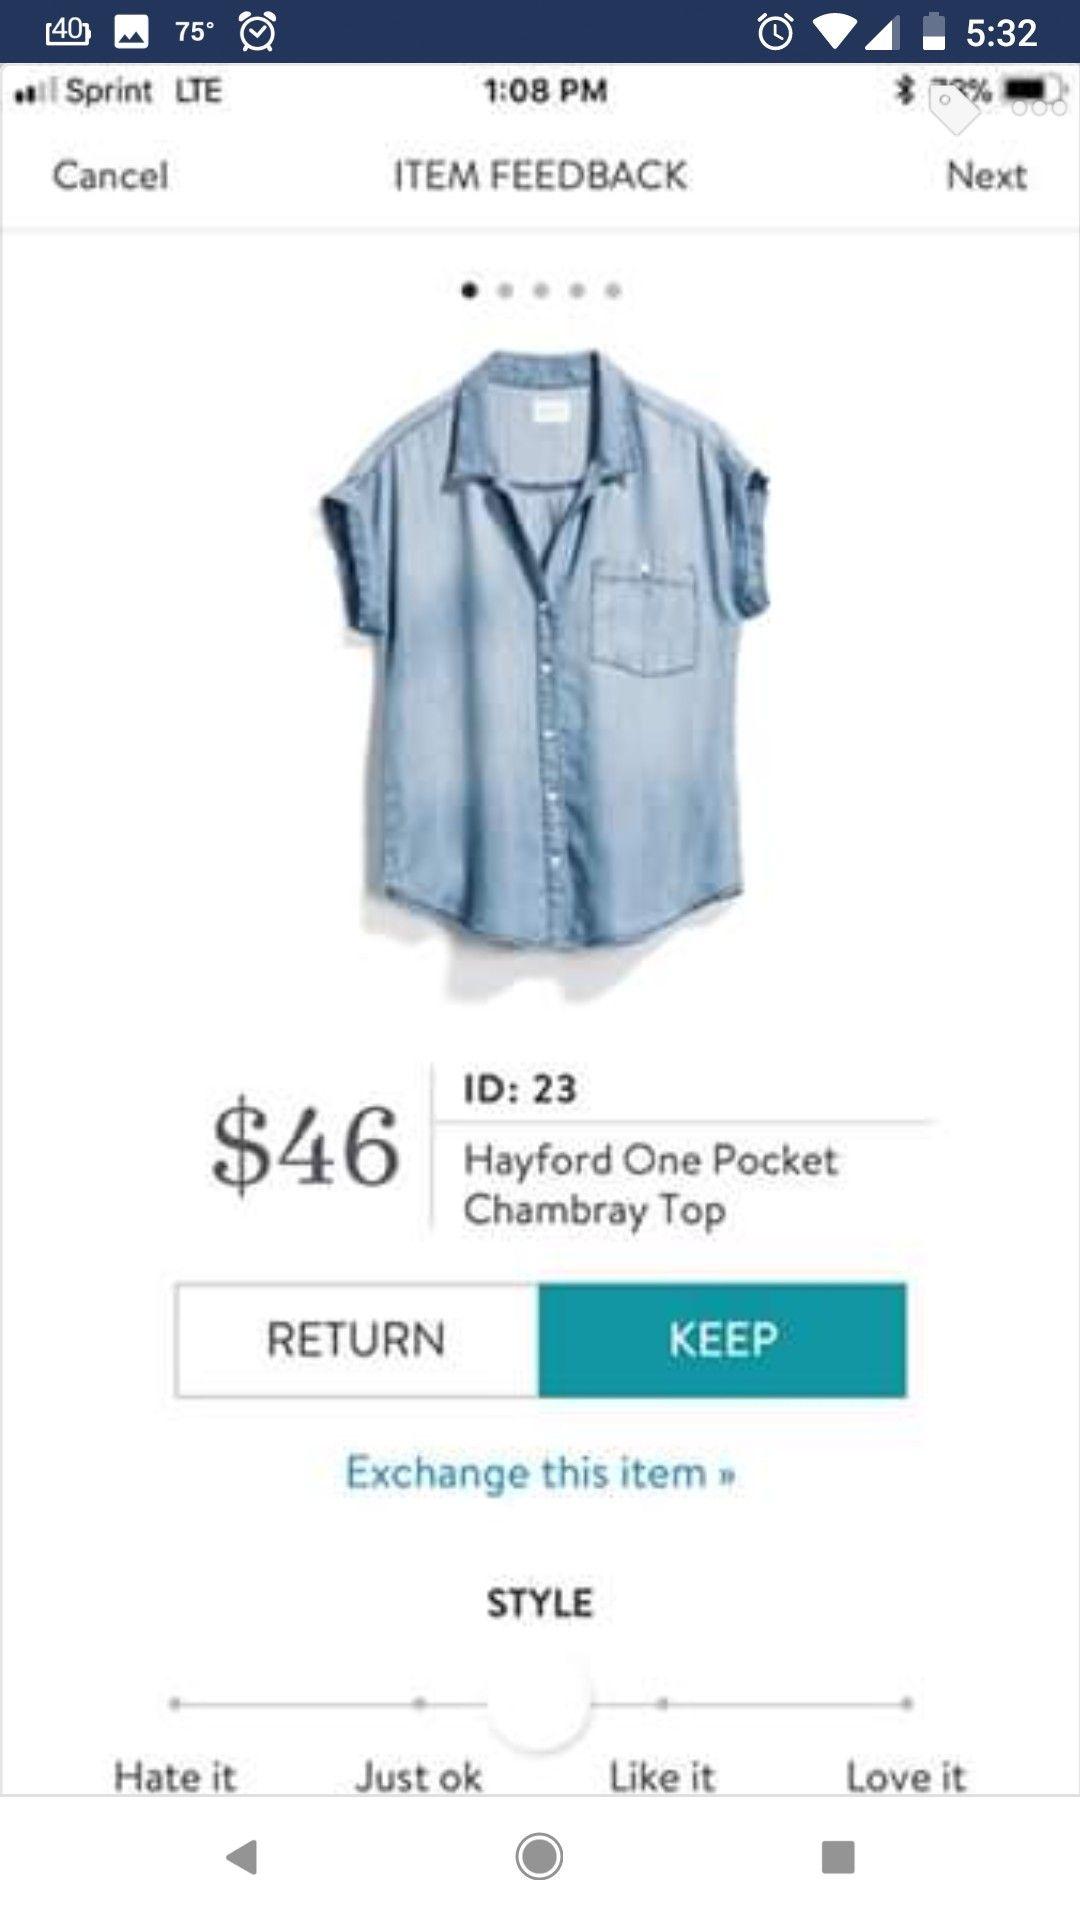 b1135f8f153 Stitch Fix Outfits, Denim Button Up, Button Up Shirts, I Dress, Dress